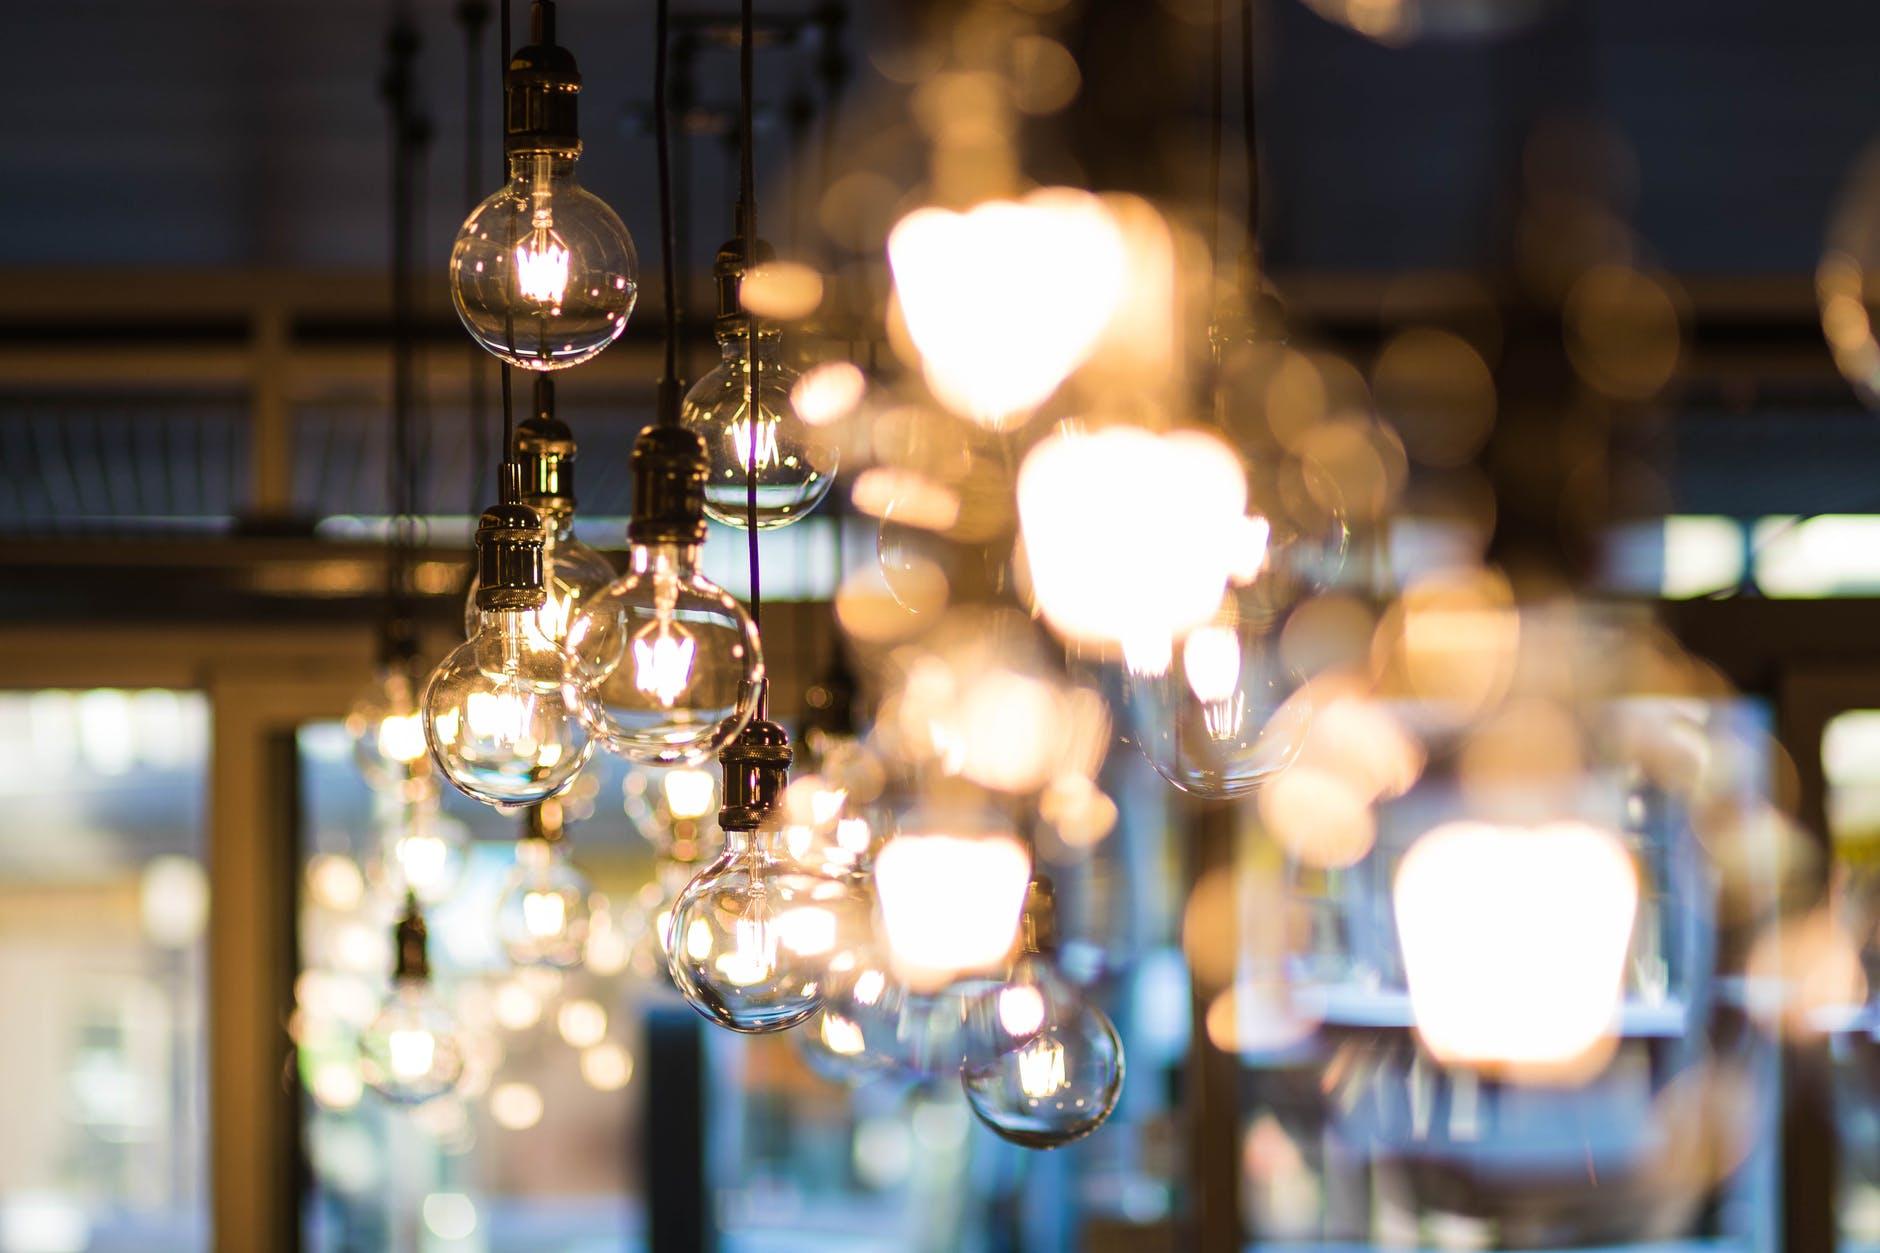 shallow focus photograph of pendant lamp